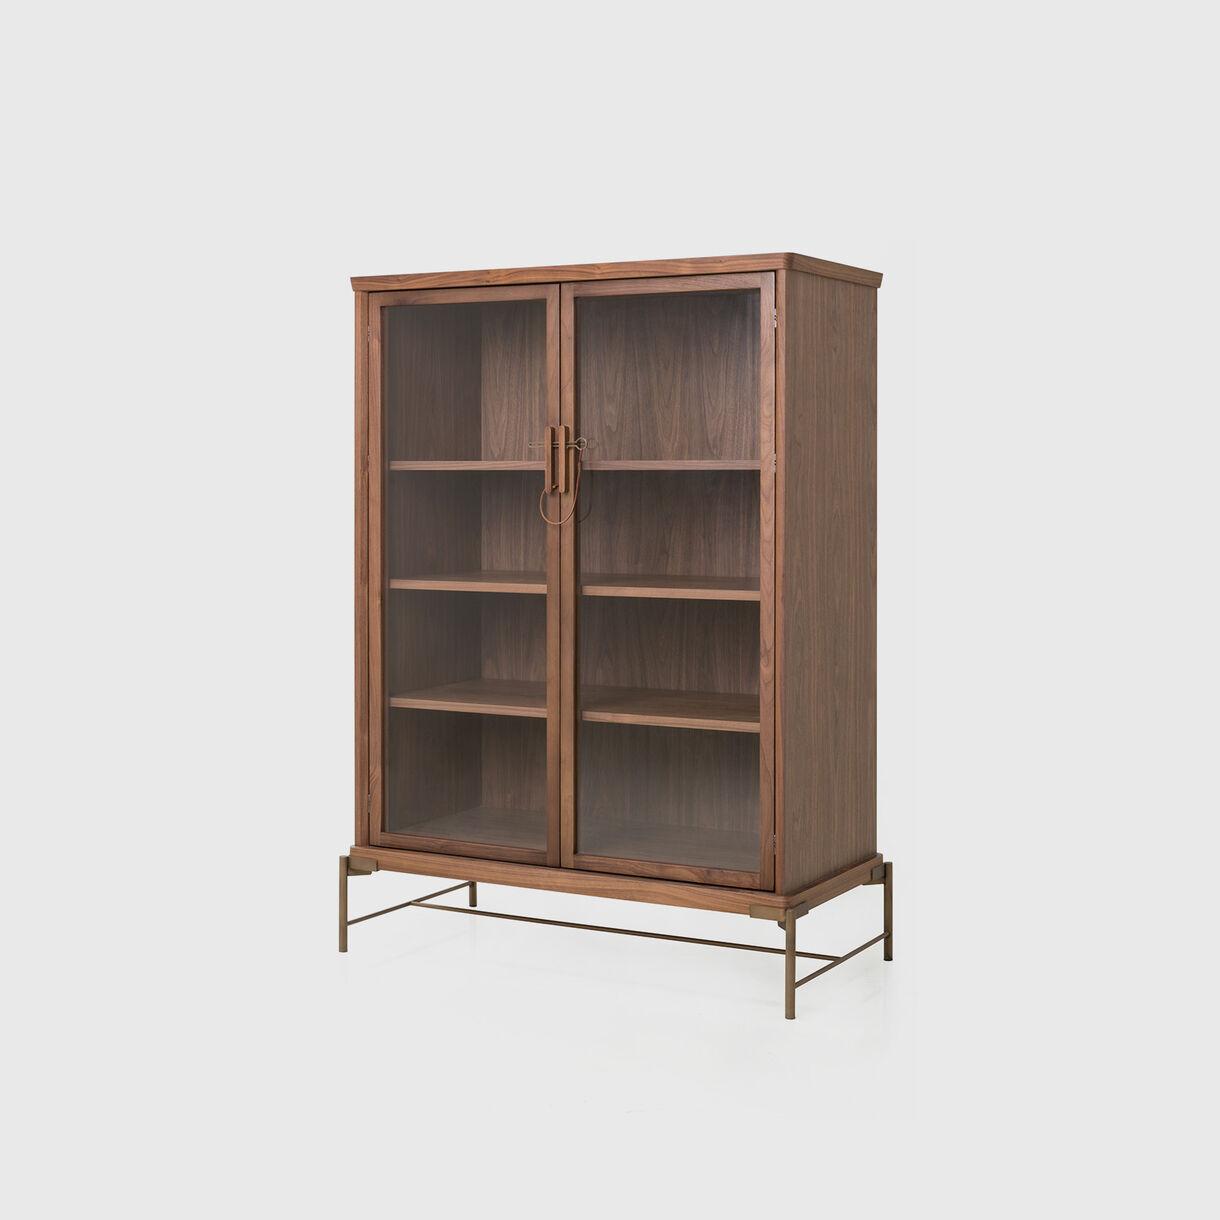 Dowry Cabinet III